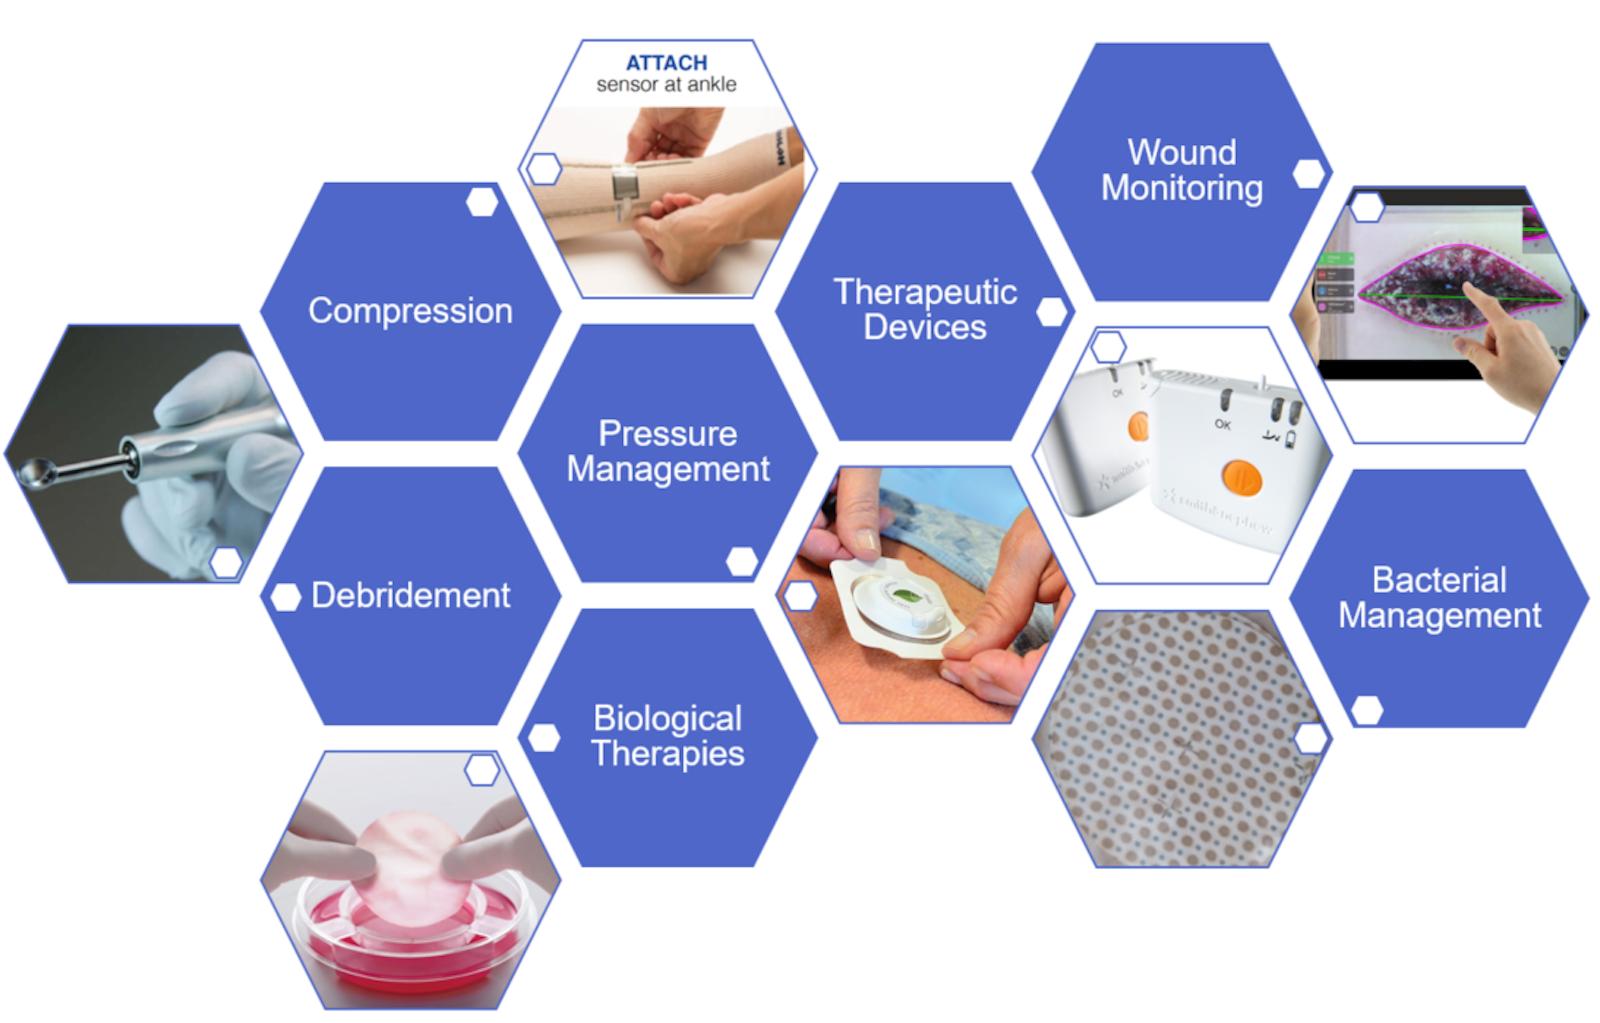 Advanced Wound Care Technologies 2020-2030: IDTechEx